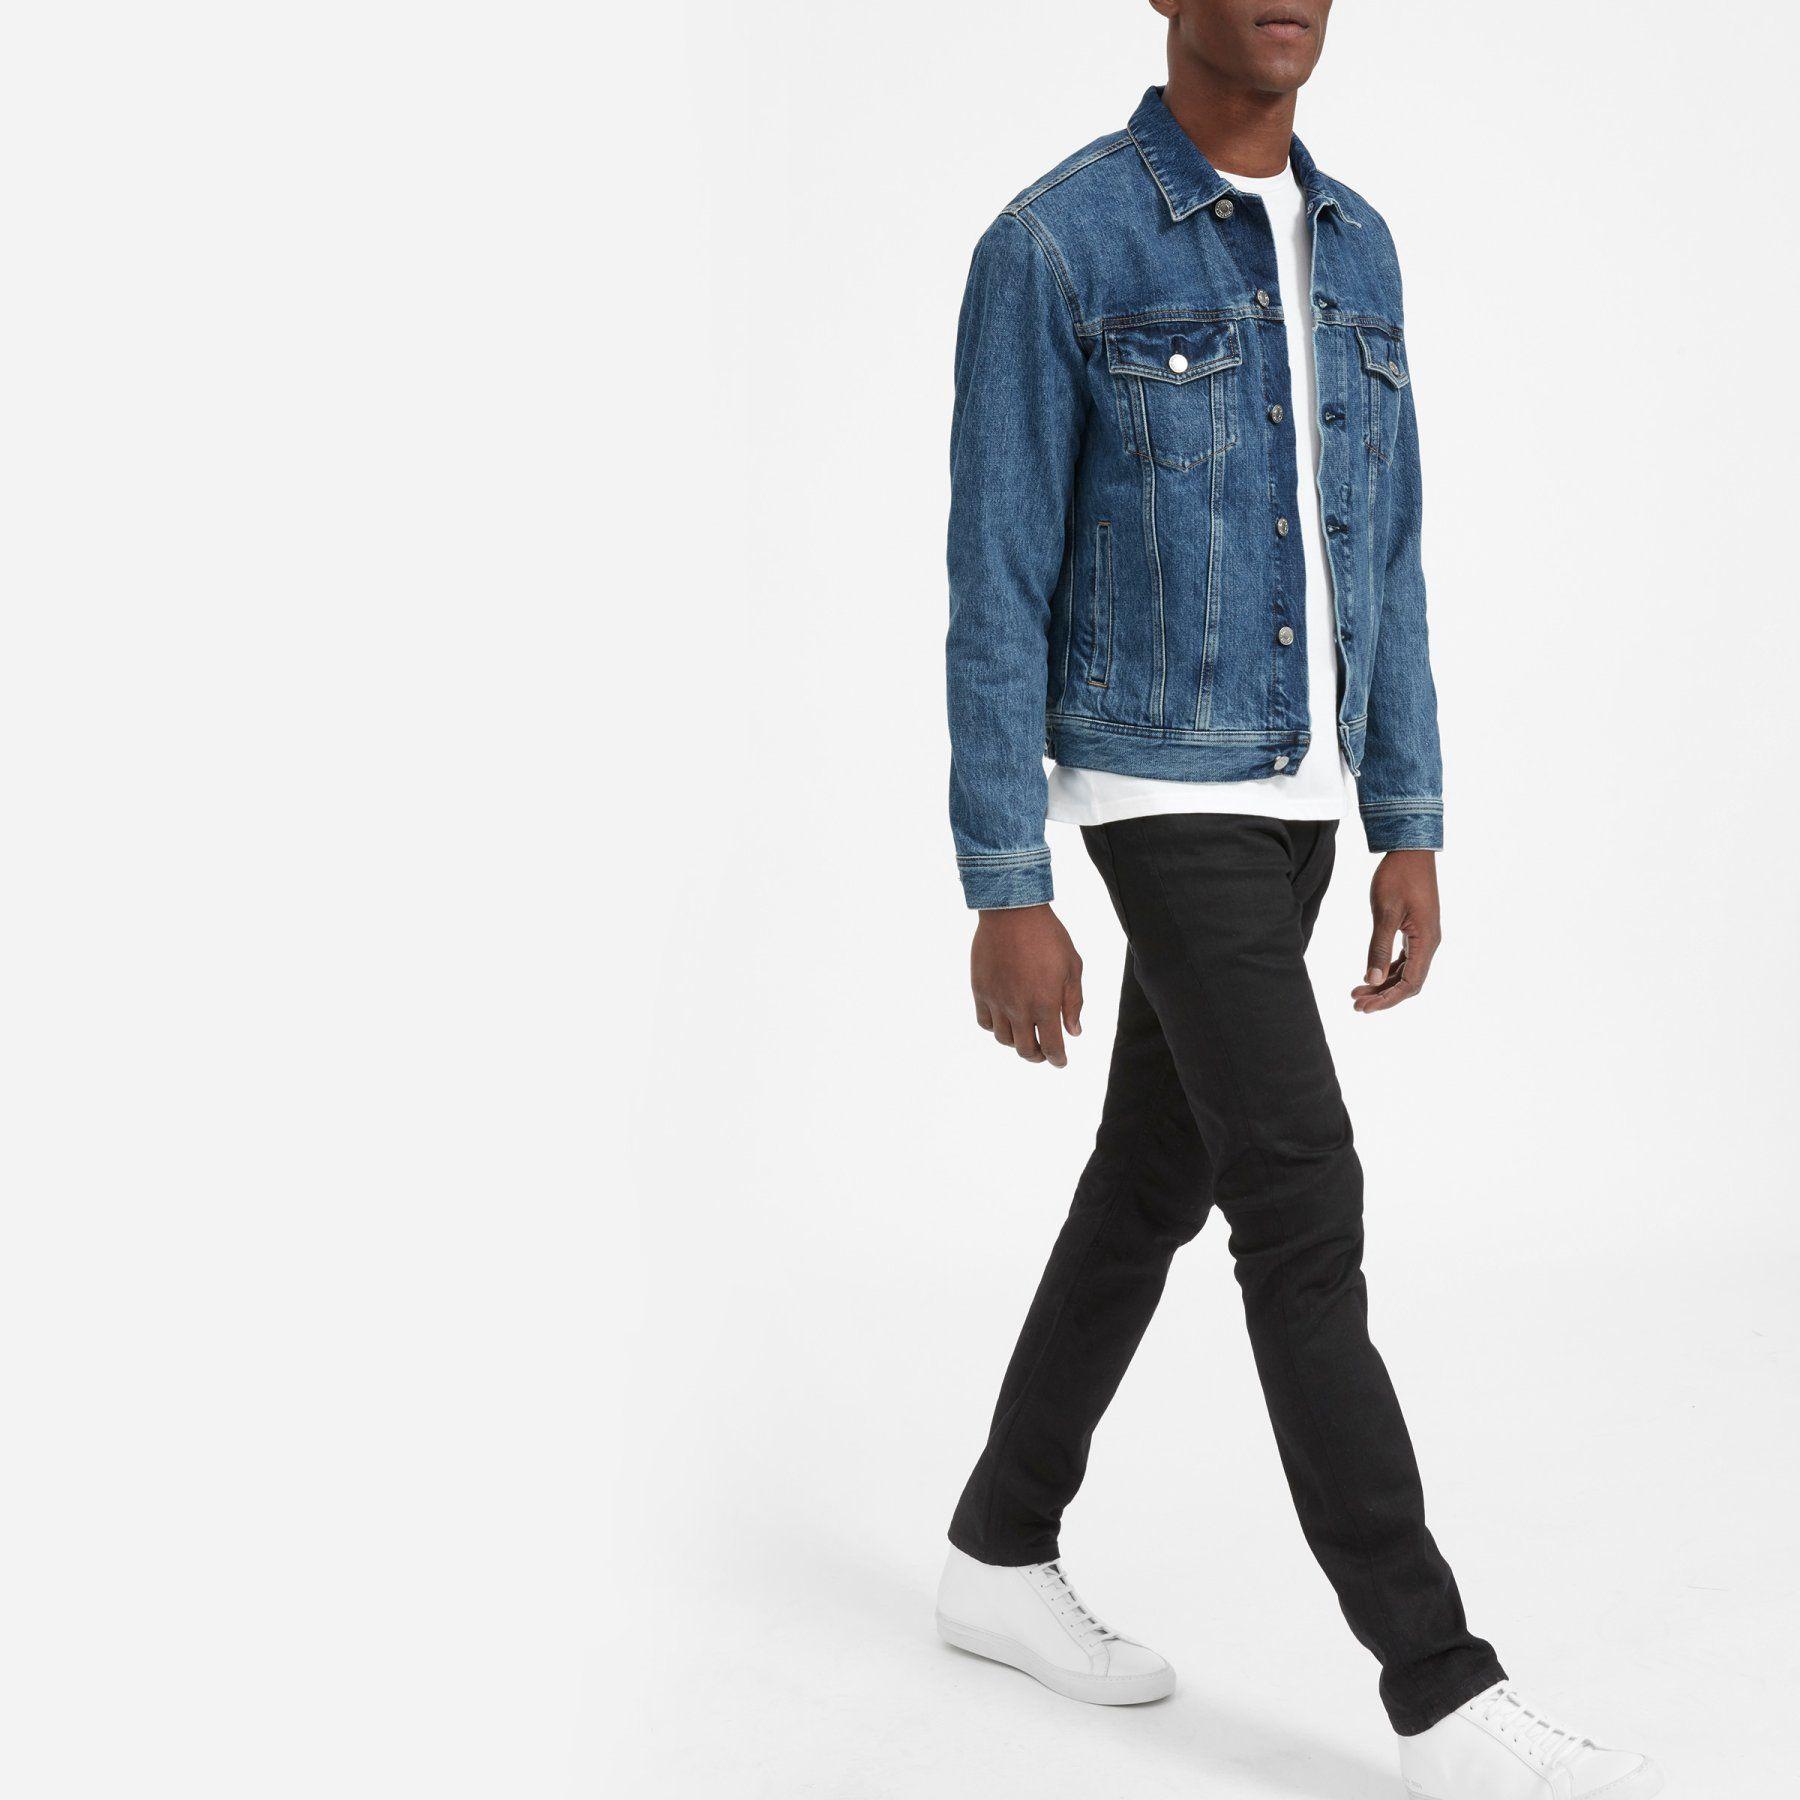 Men S Denim Jacket Everlane Jackets Men Fashion Mens Jackets Denim Jacket Men [ 1800 x 1800 Pixel ]